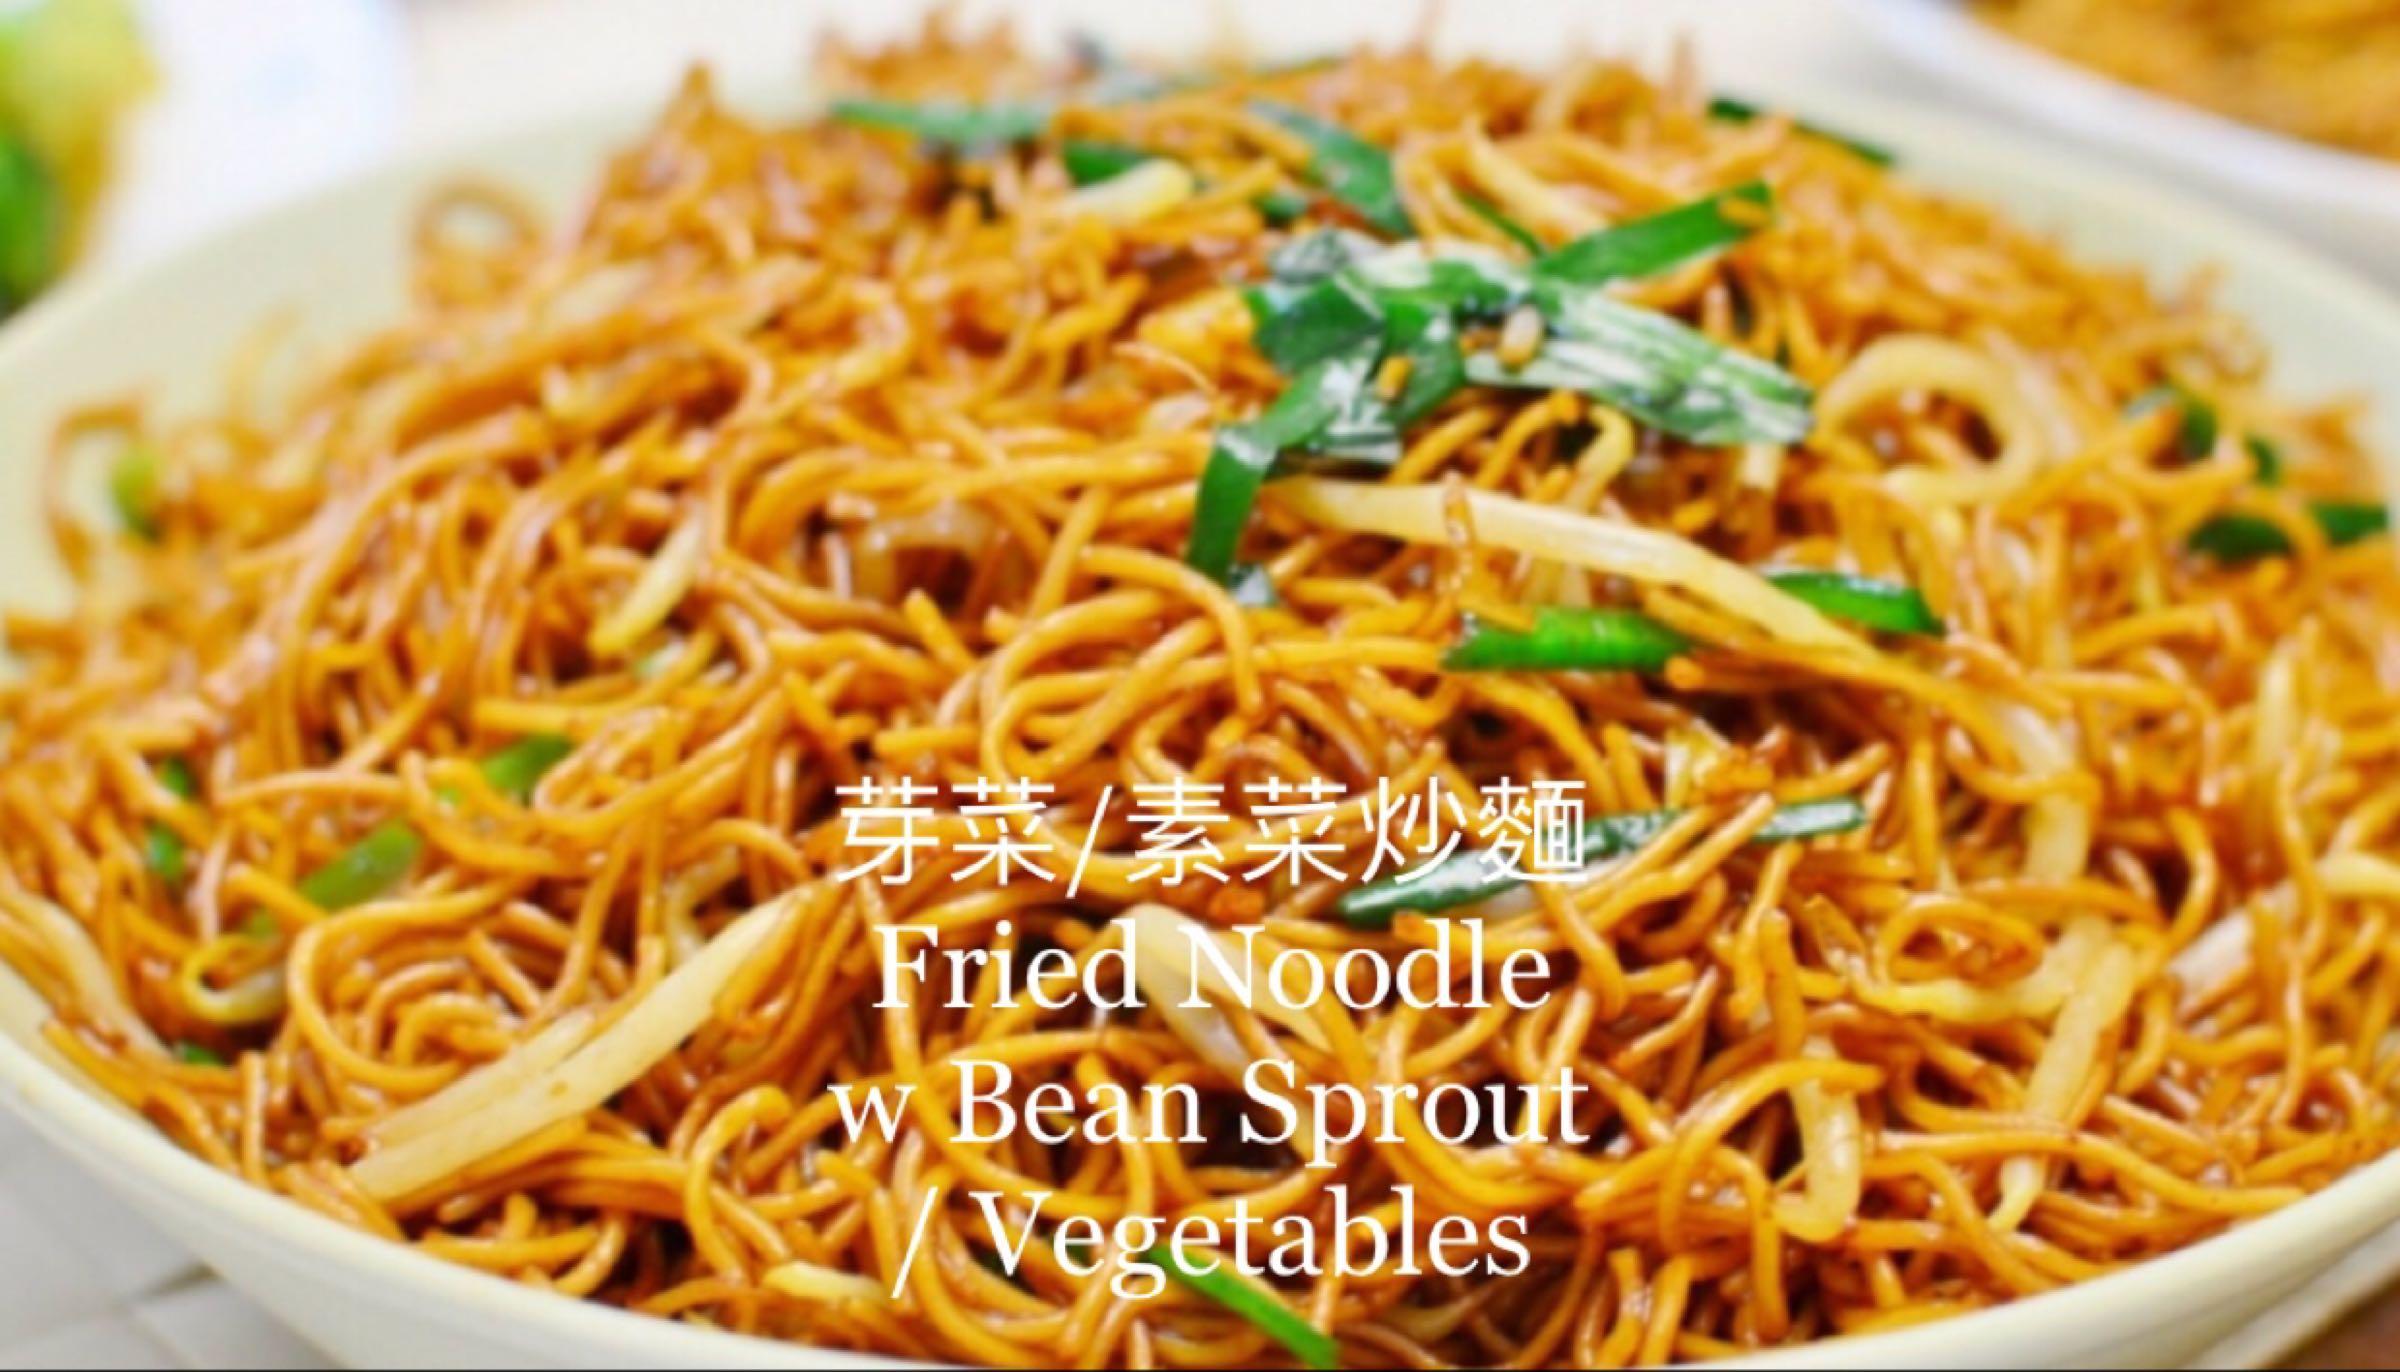 素菜炒麵 Veg Fried Noodle